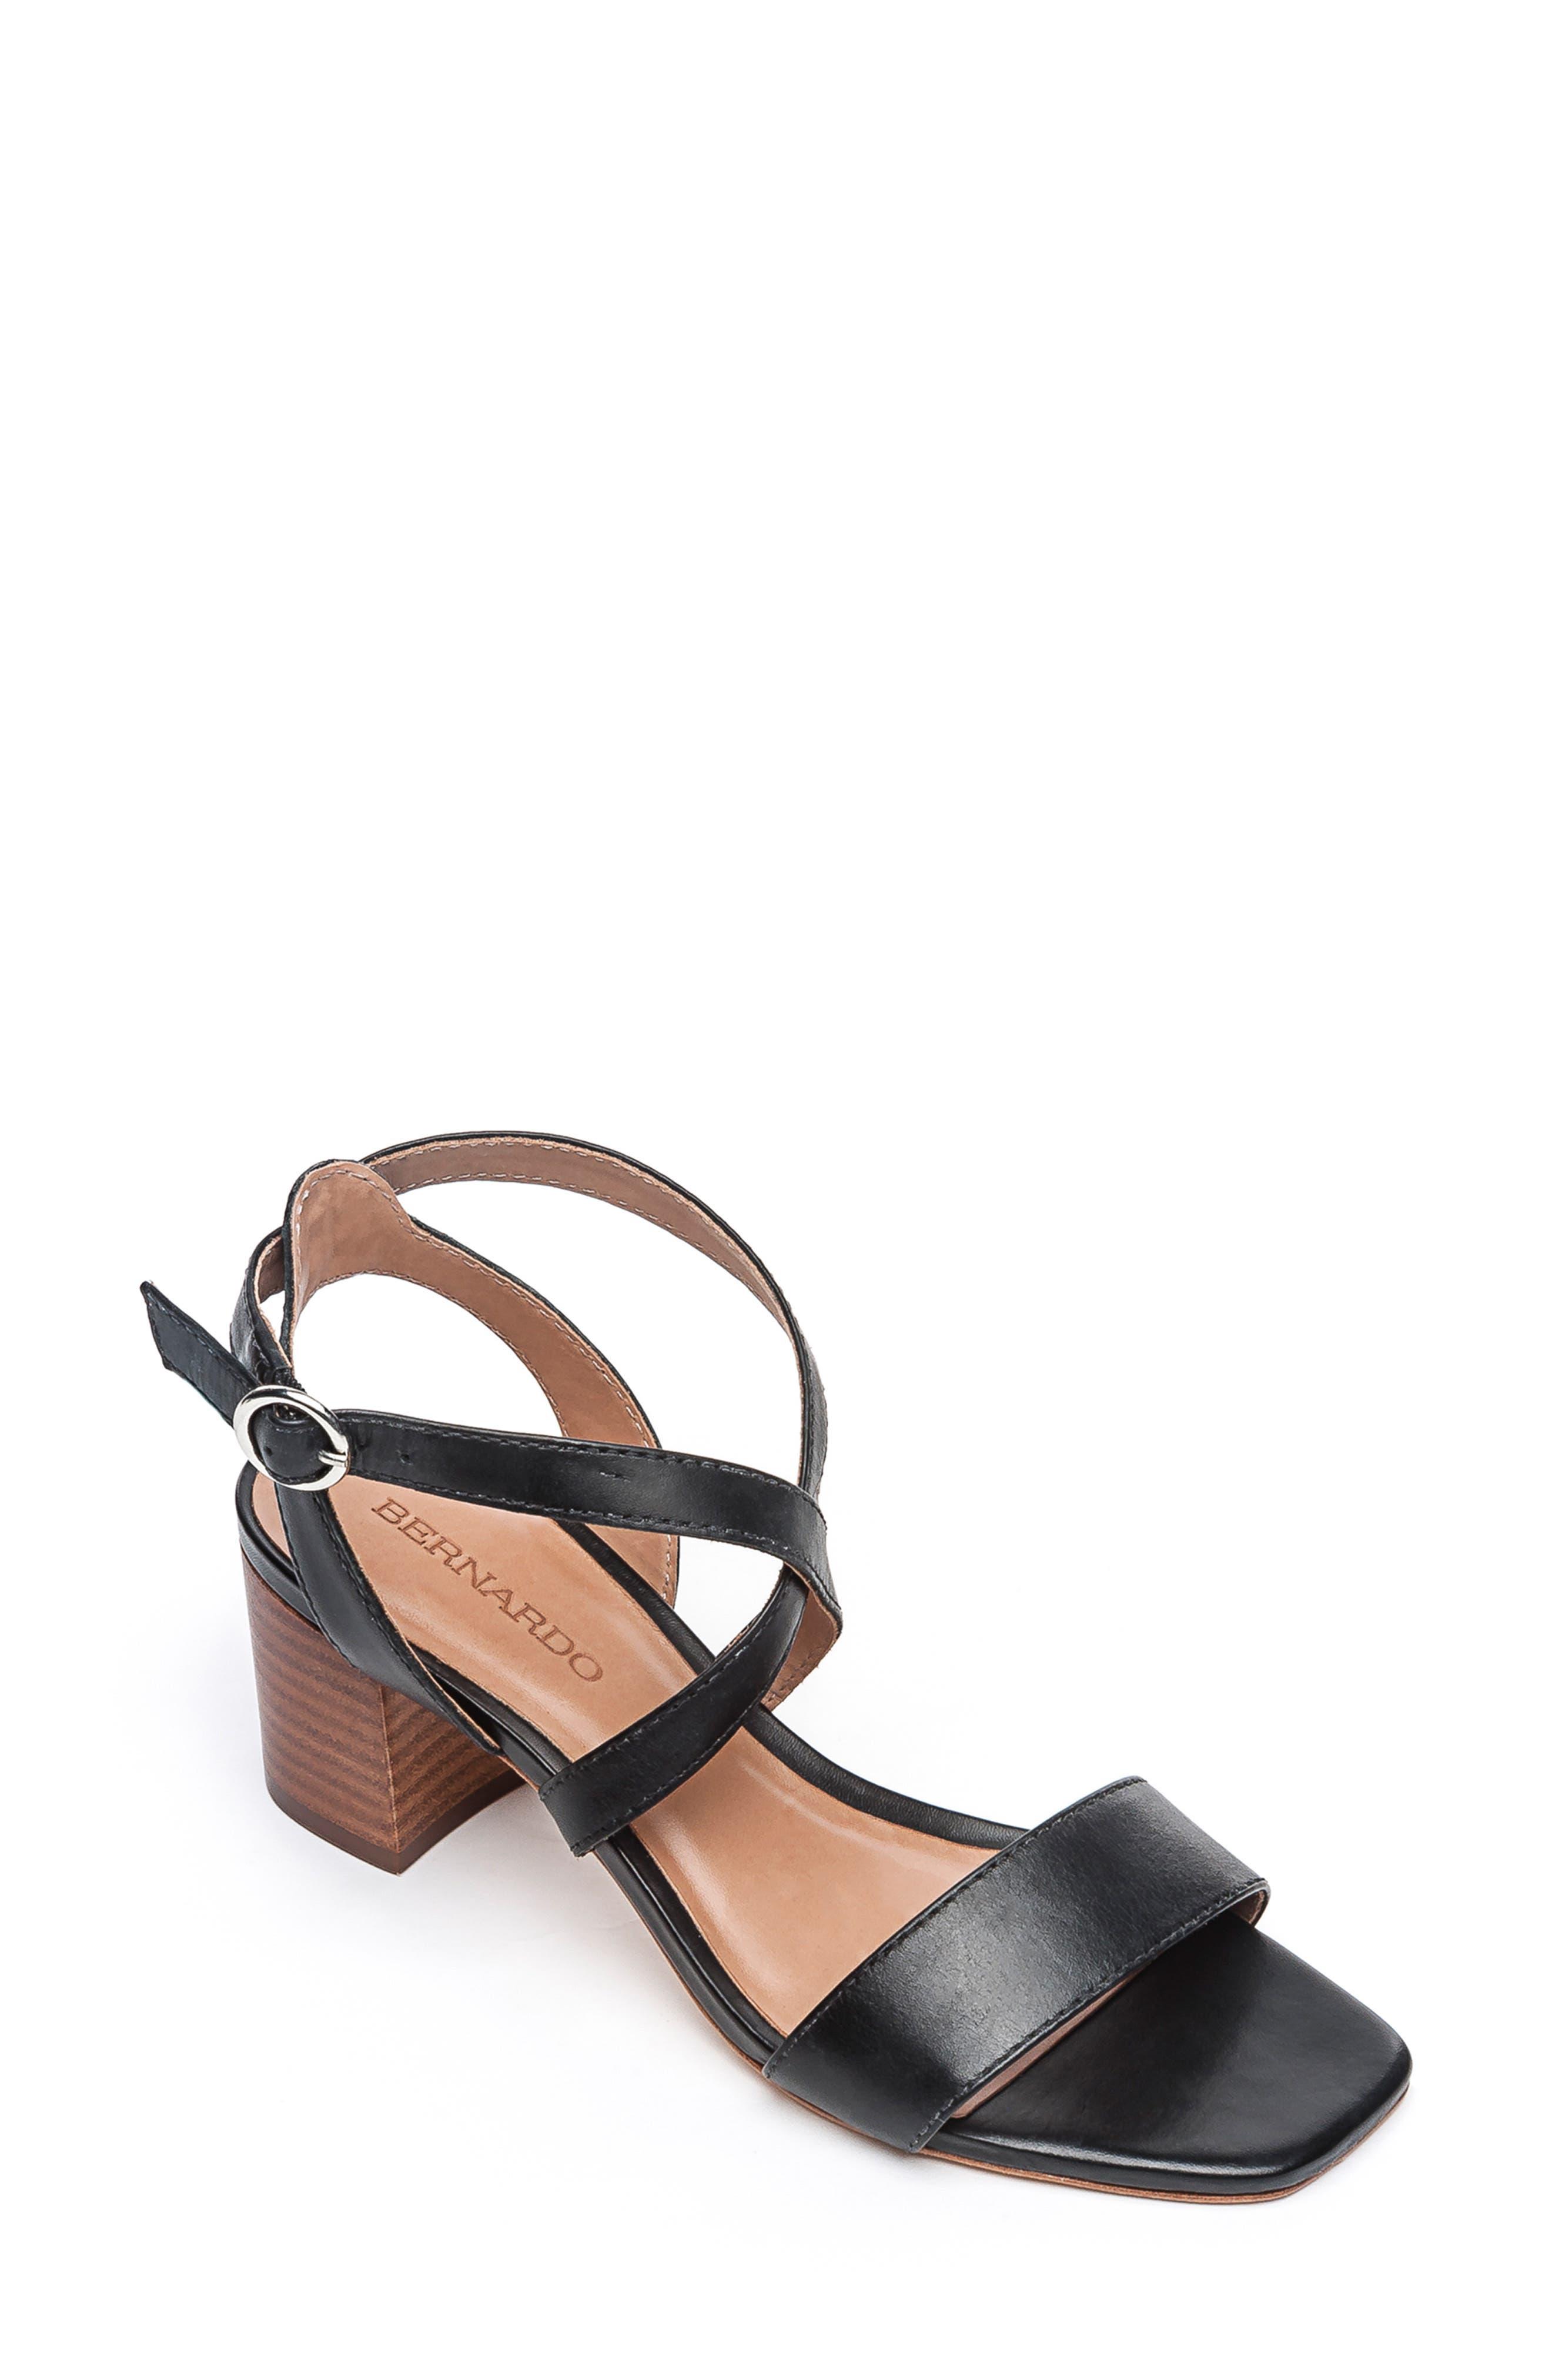 Bernardo Brielle Block Heel Sandal, Black